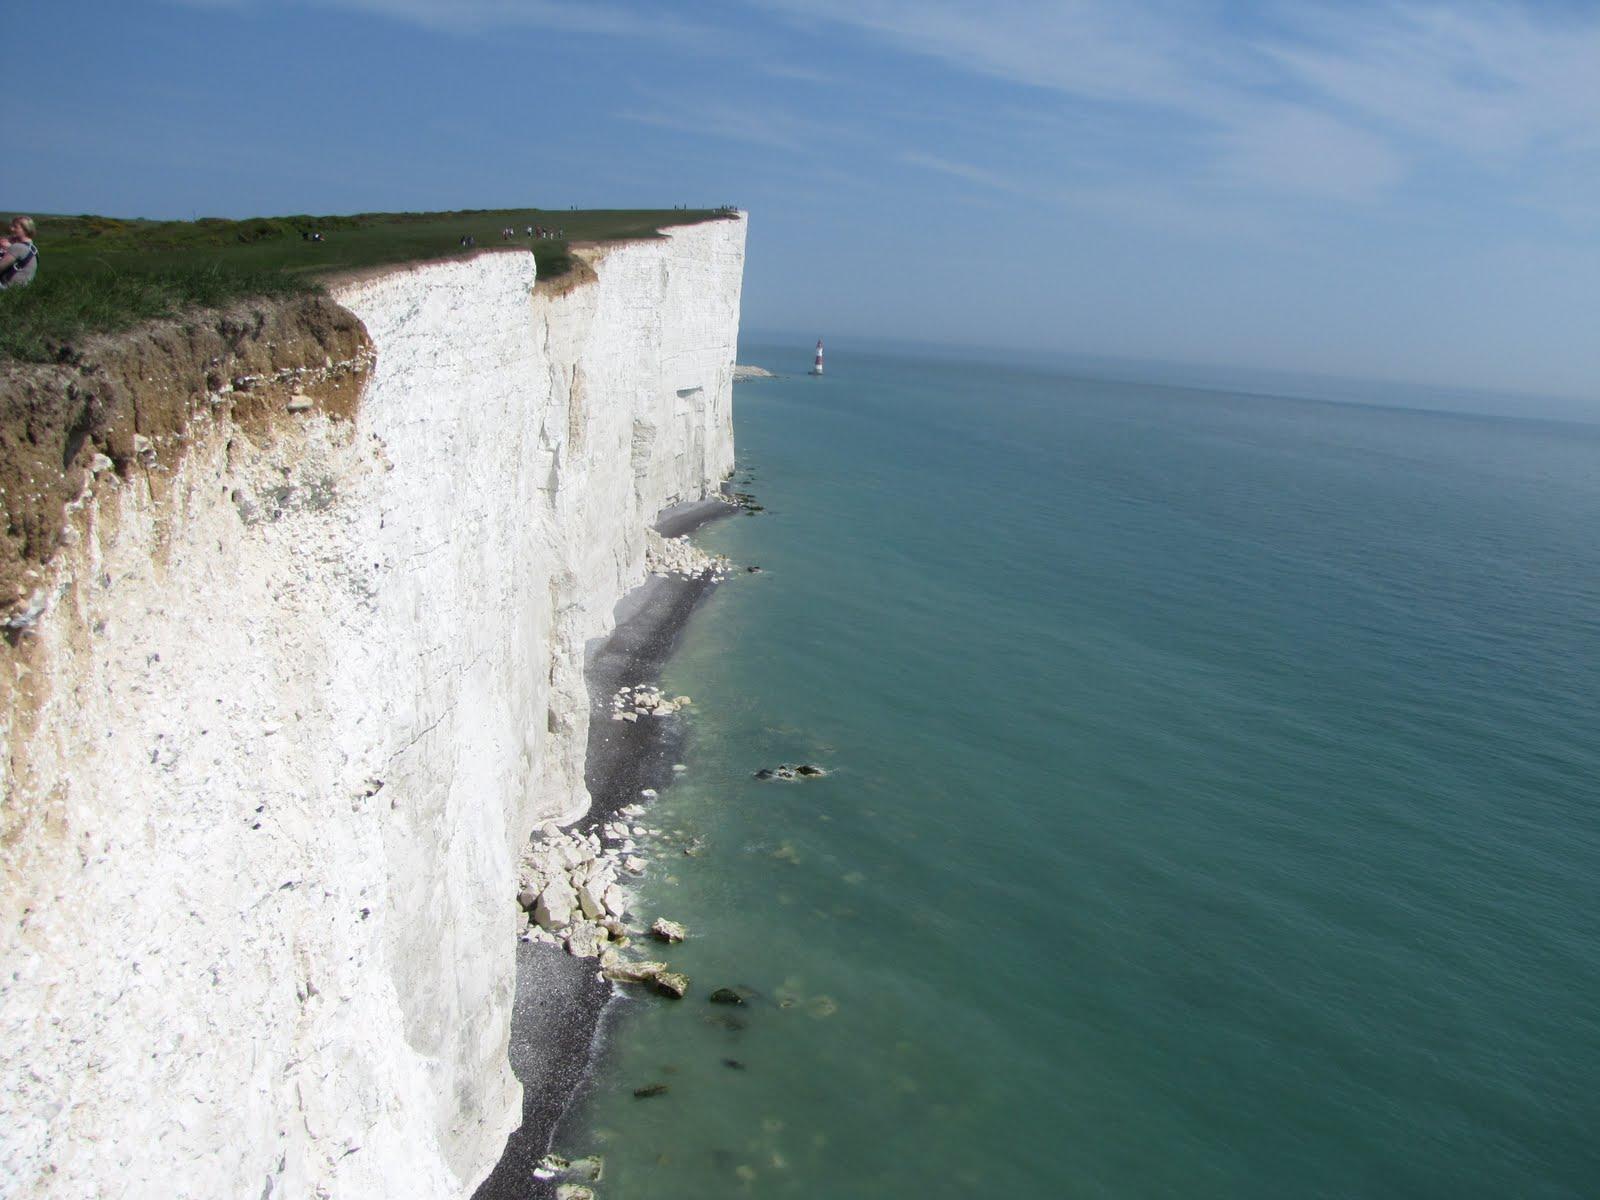 Http Traveltripjourney Blogspot Com 2012 11 Beachy Head East Sussex England Html